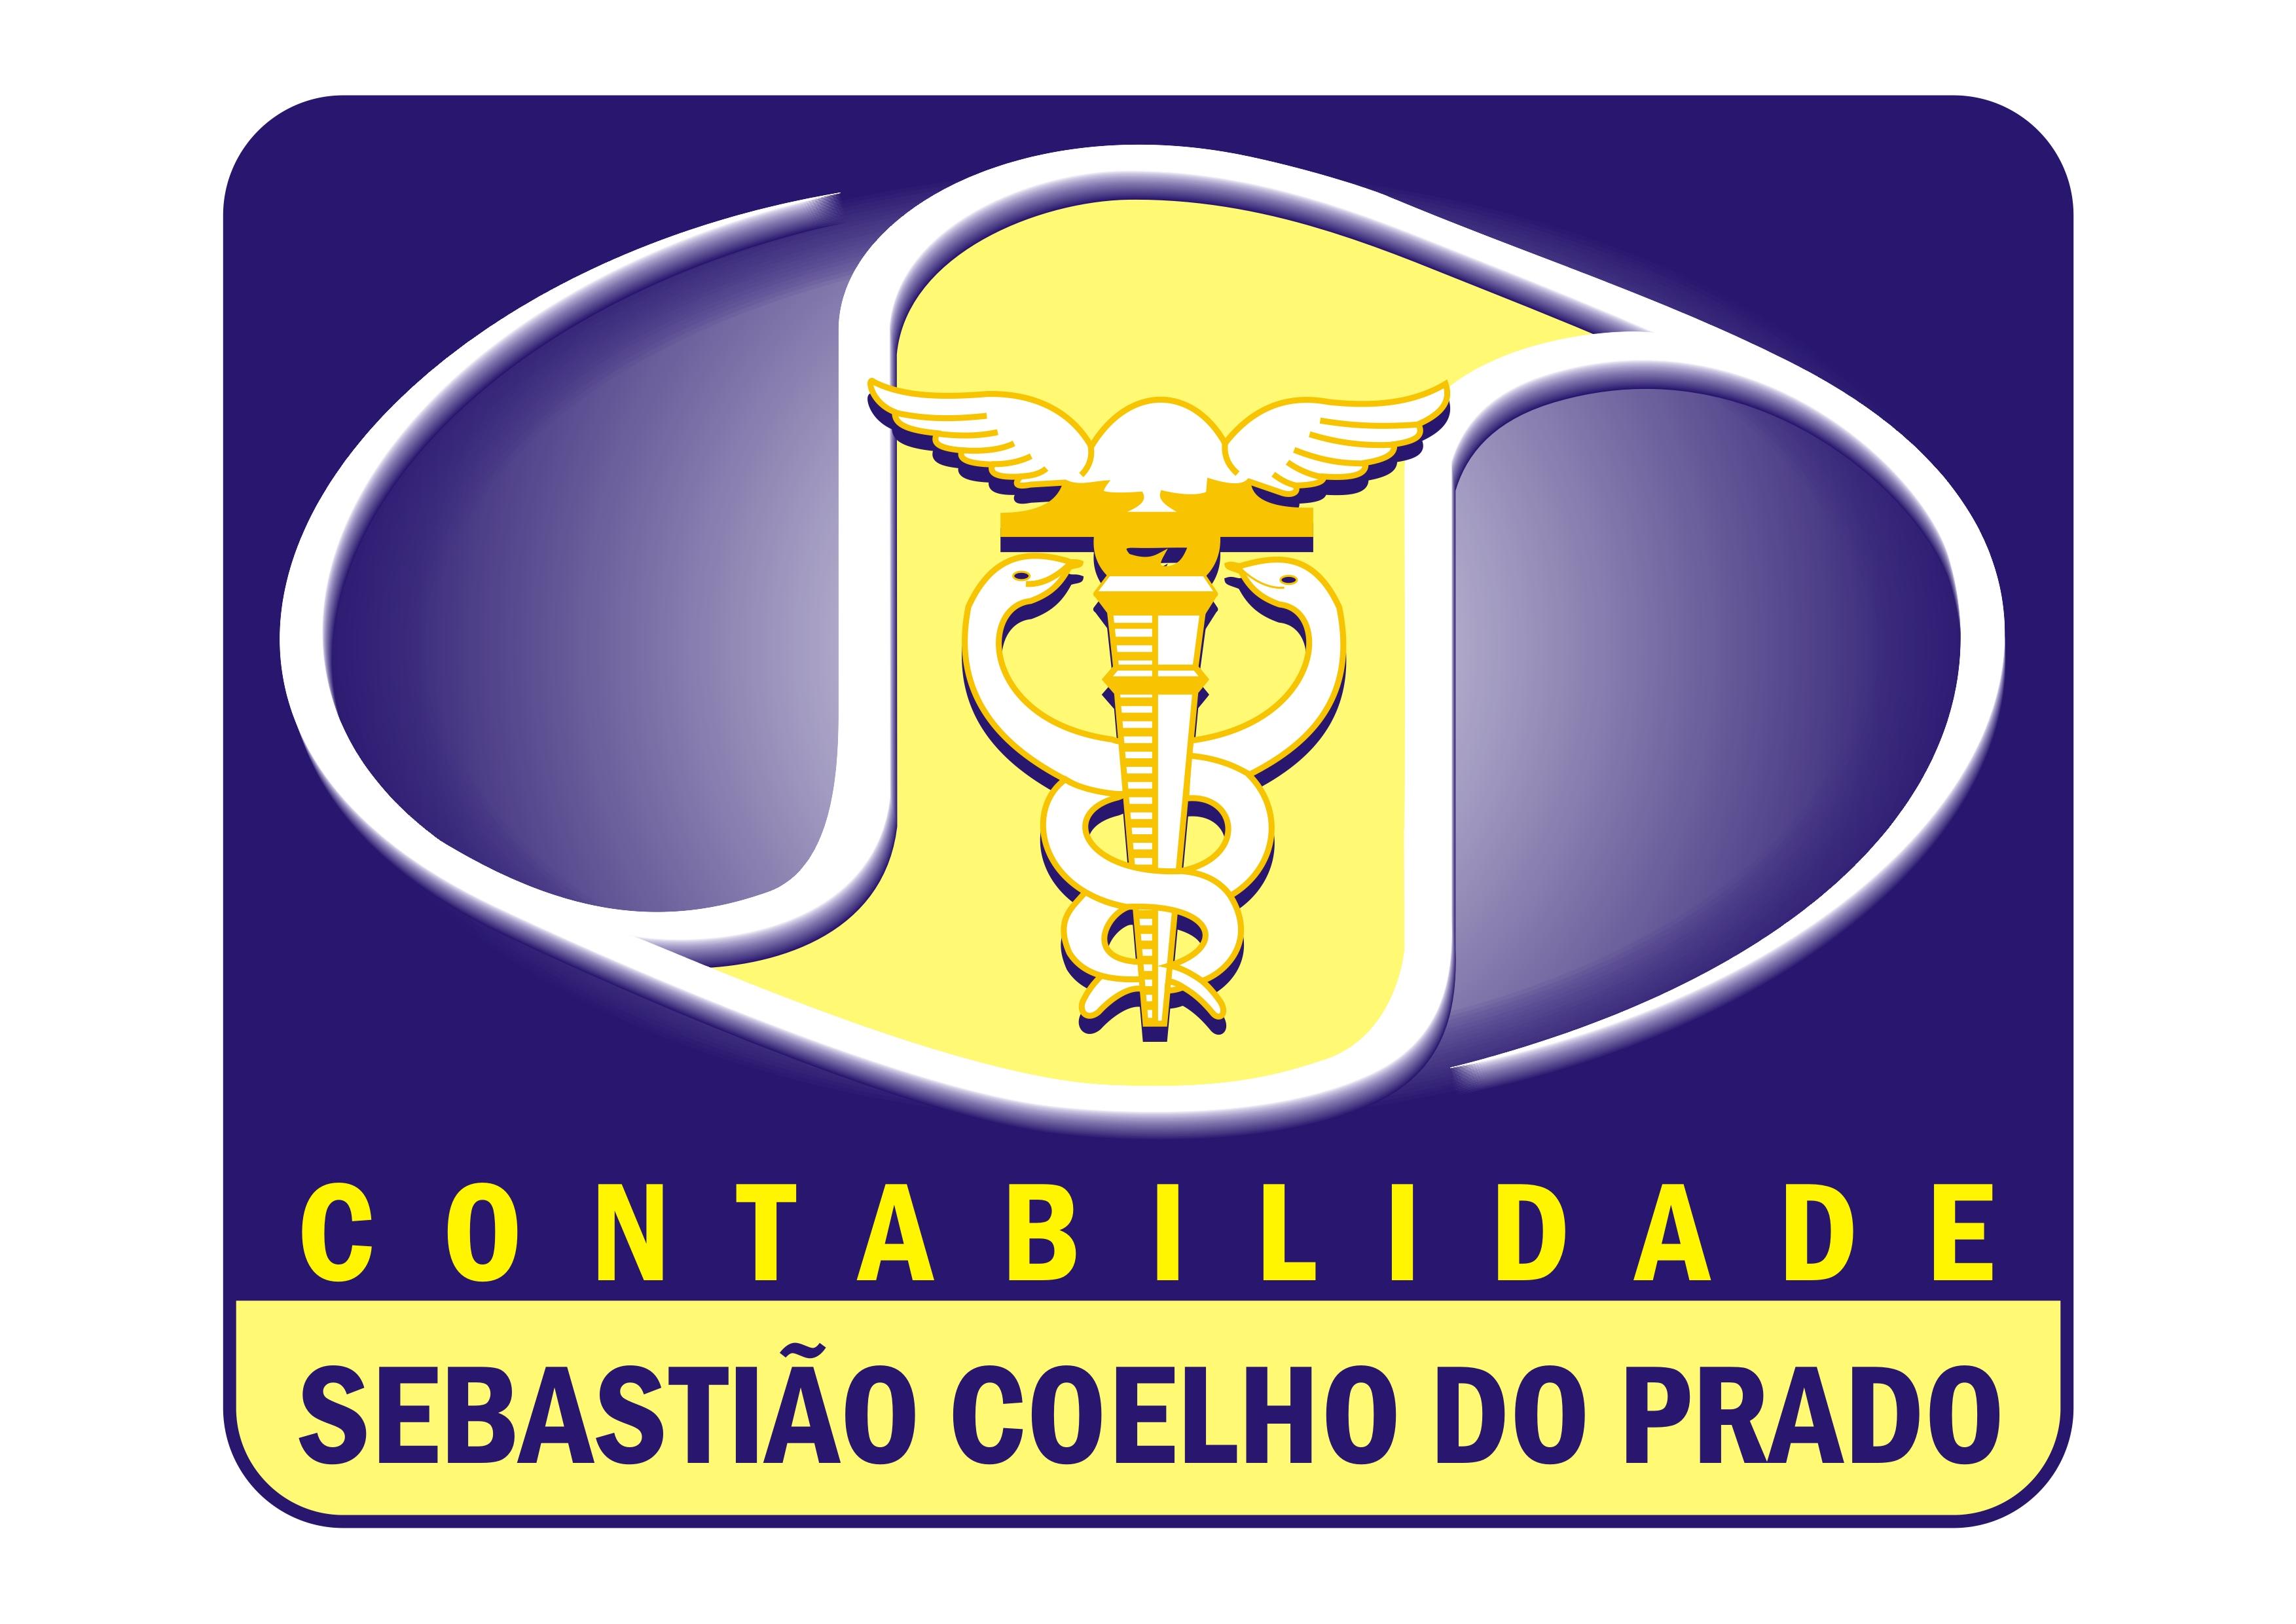 Sebastião Ceolho do Prado